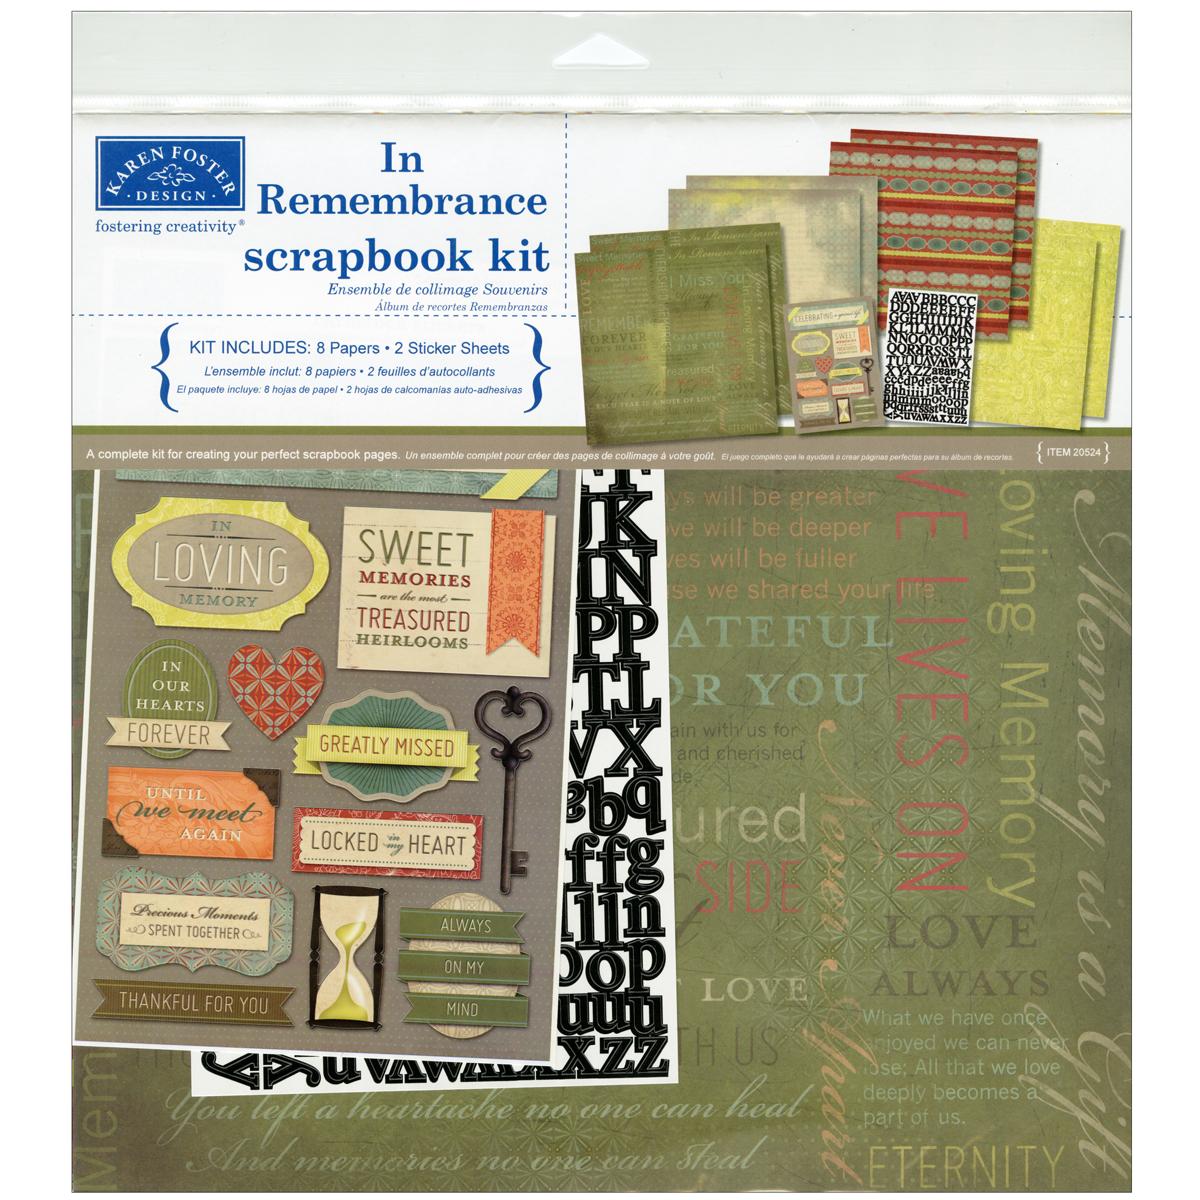 In Remembrance Scrapbook Kit